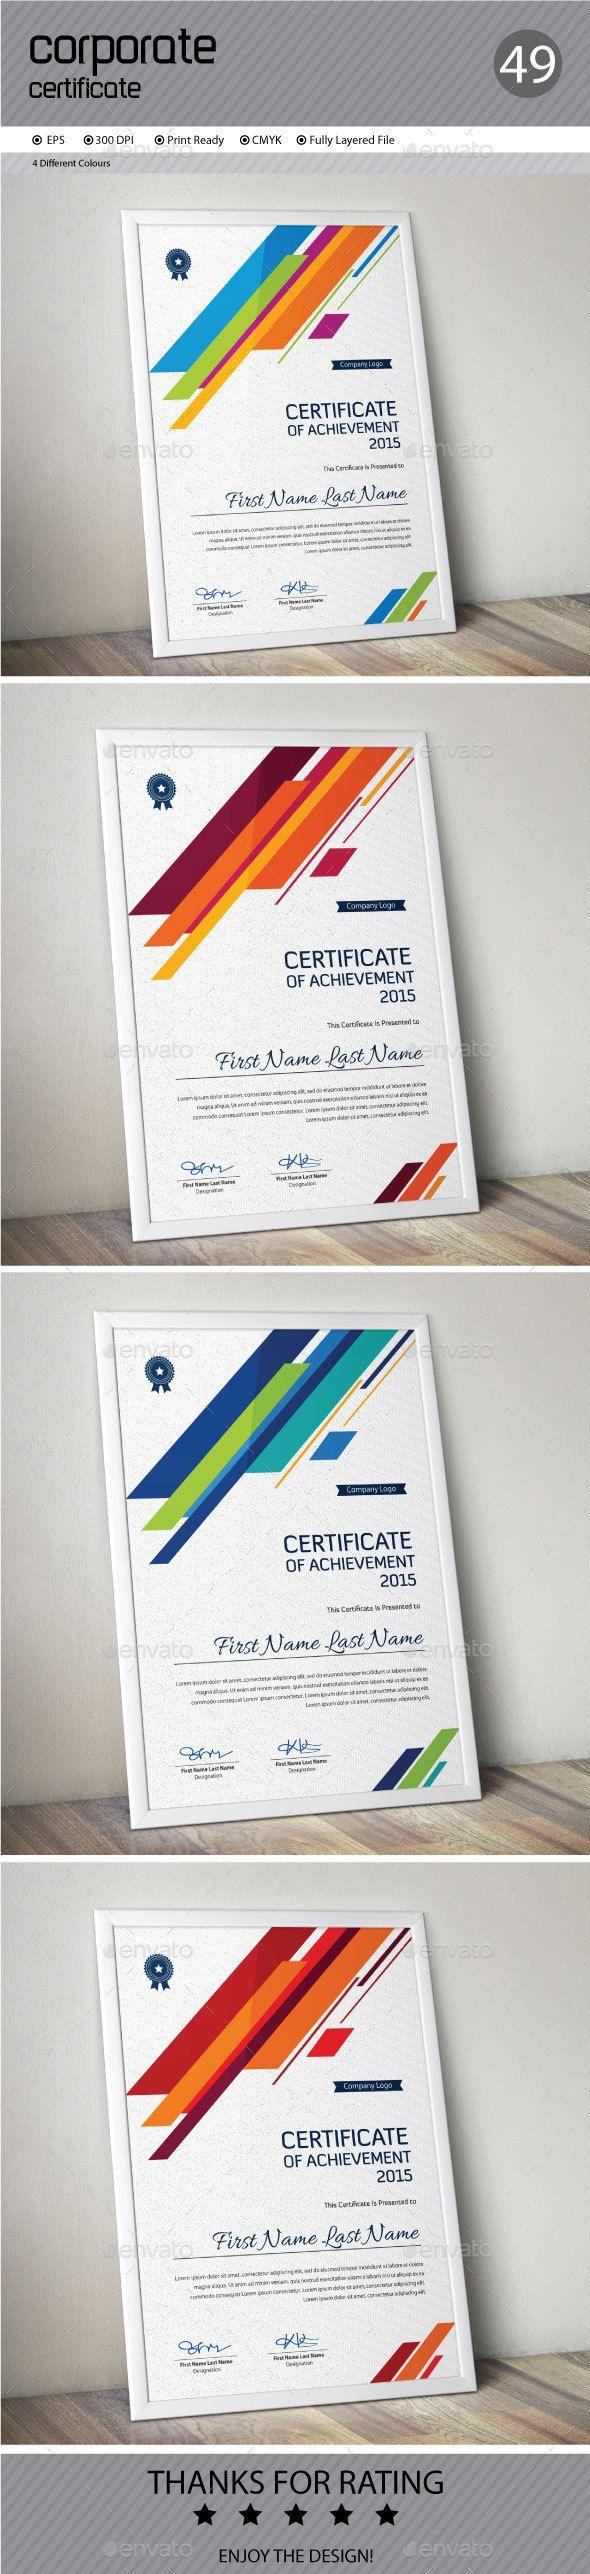 Certificate | Plakate